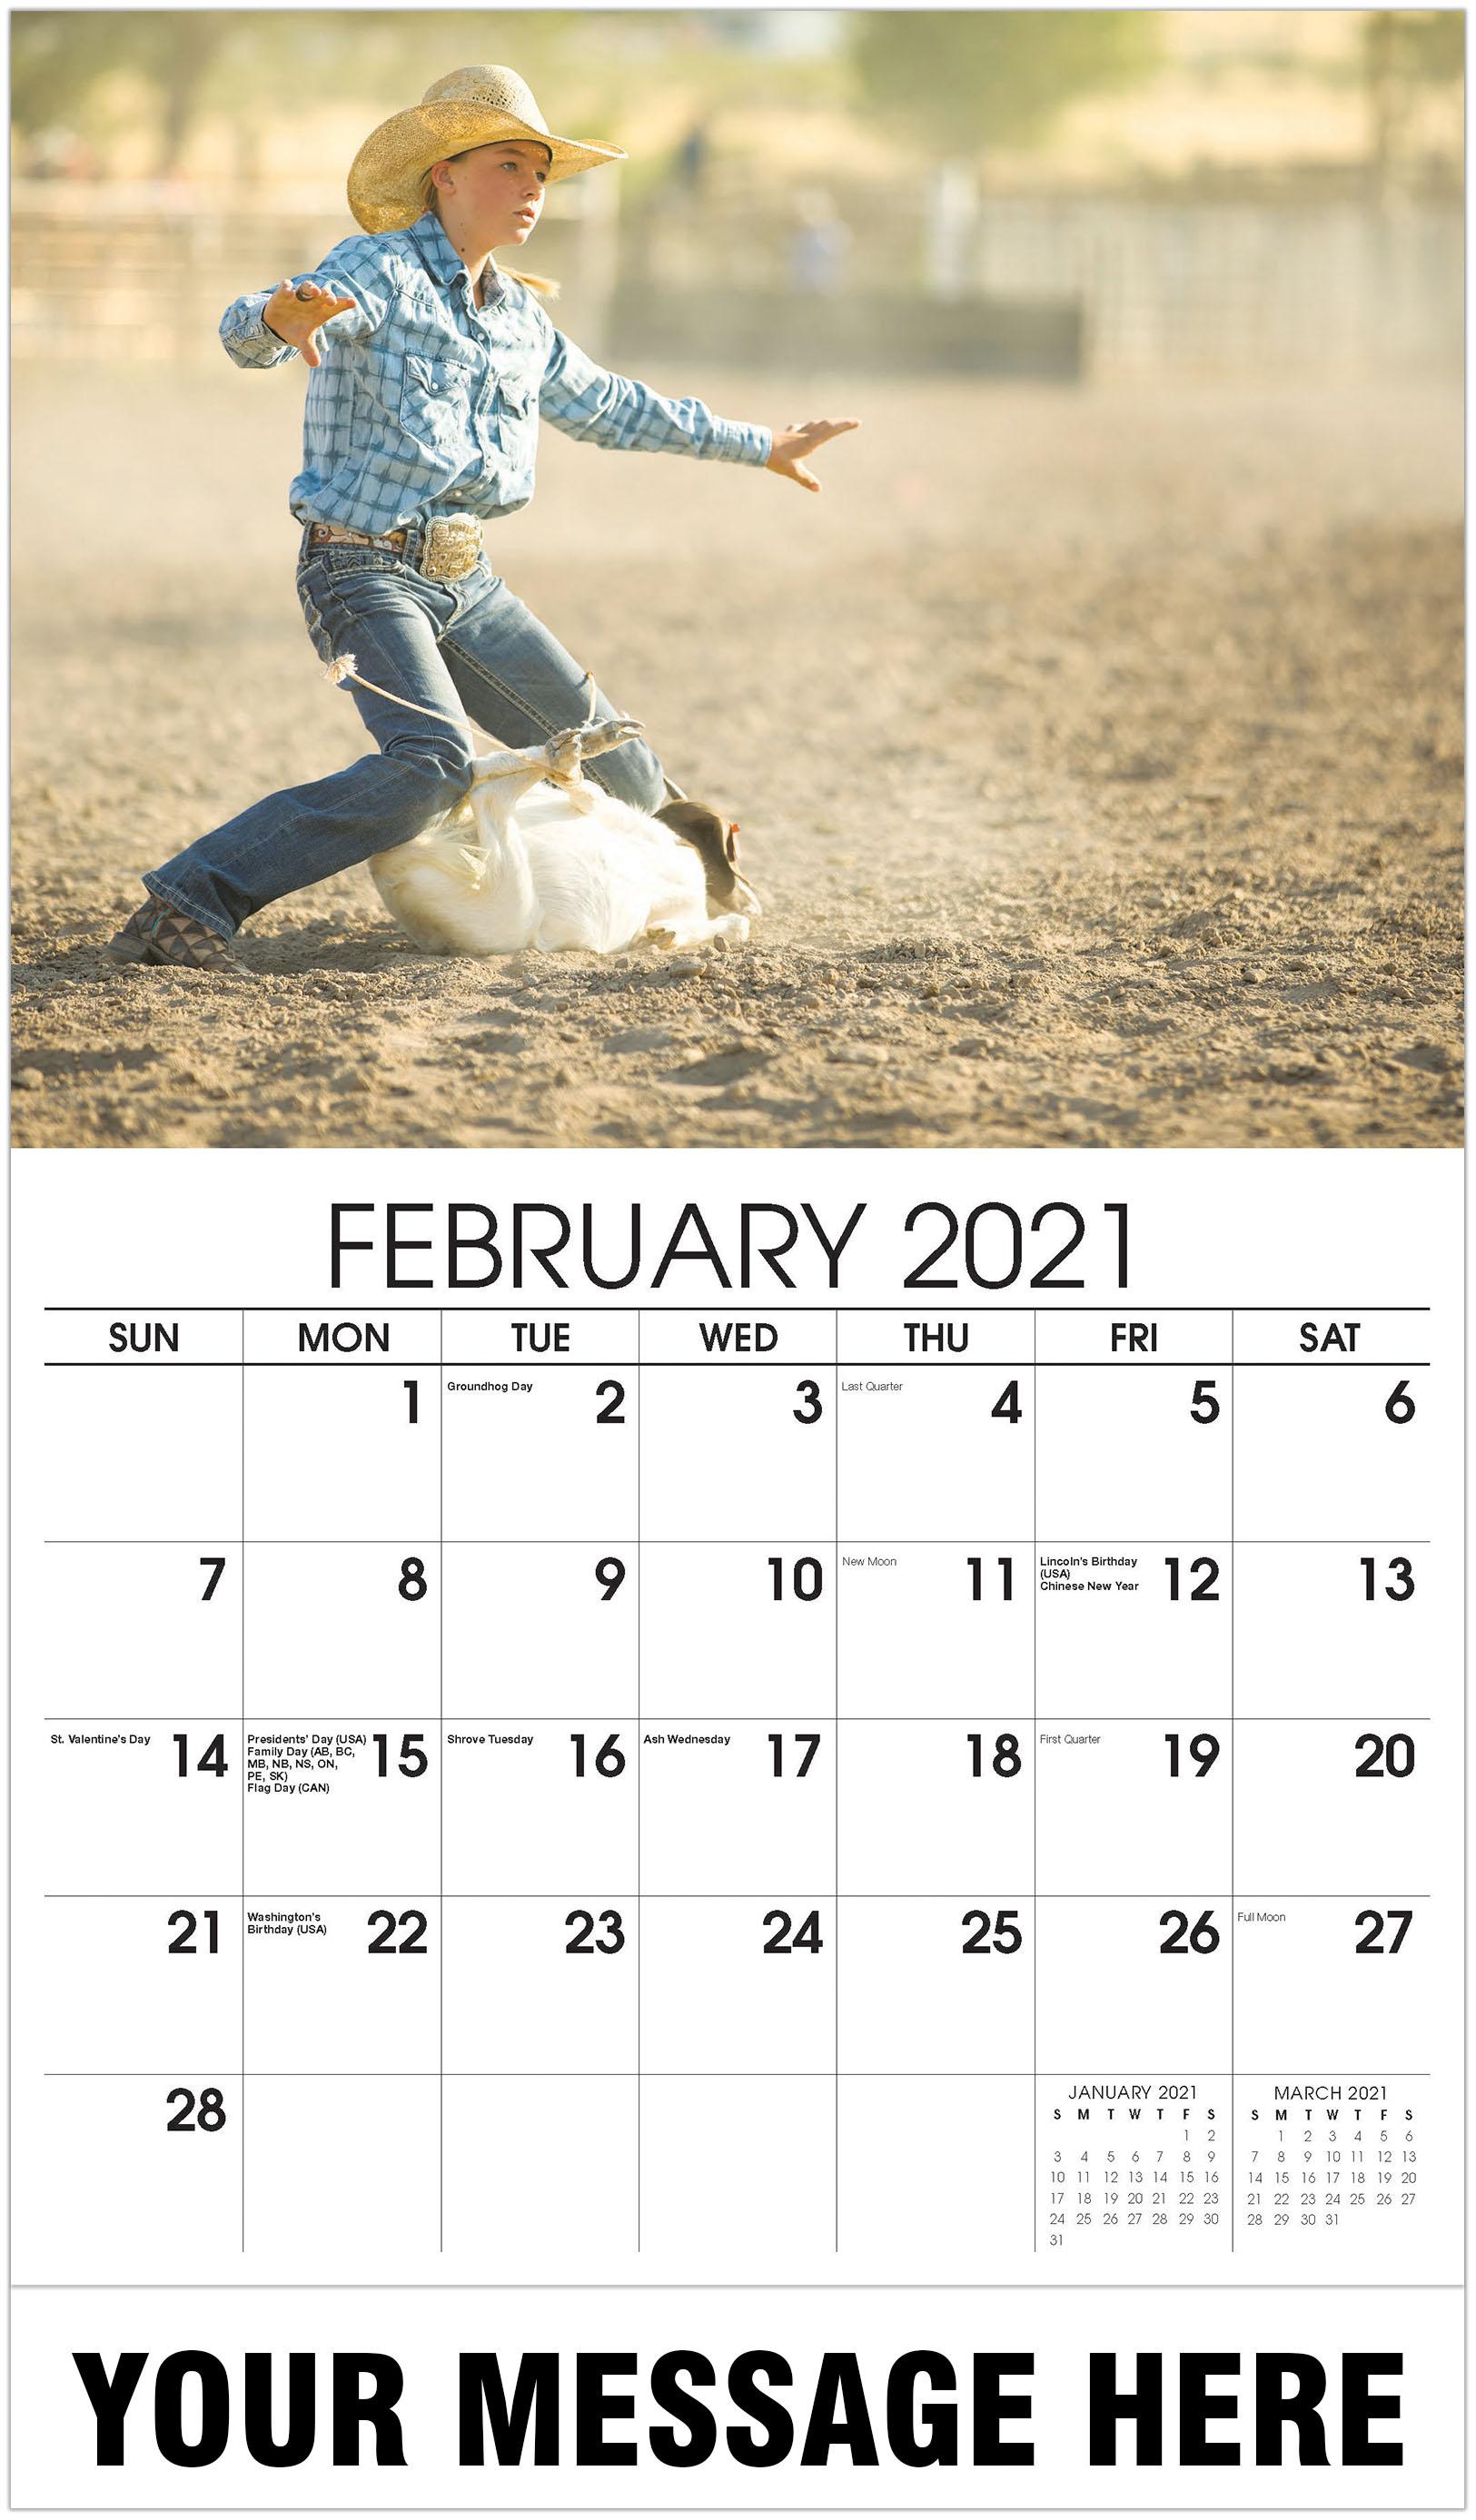 Girl calf roping - February - Country Spirit 2021 Promotional Calendar